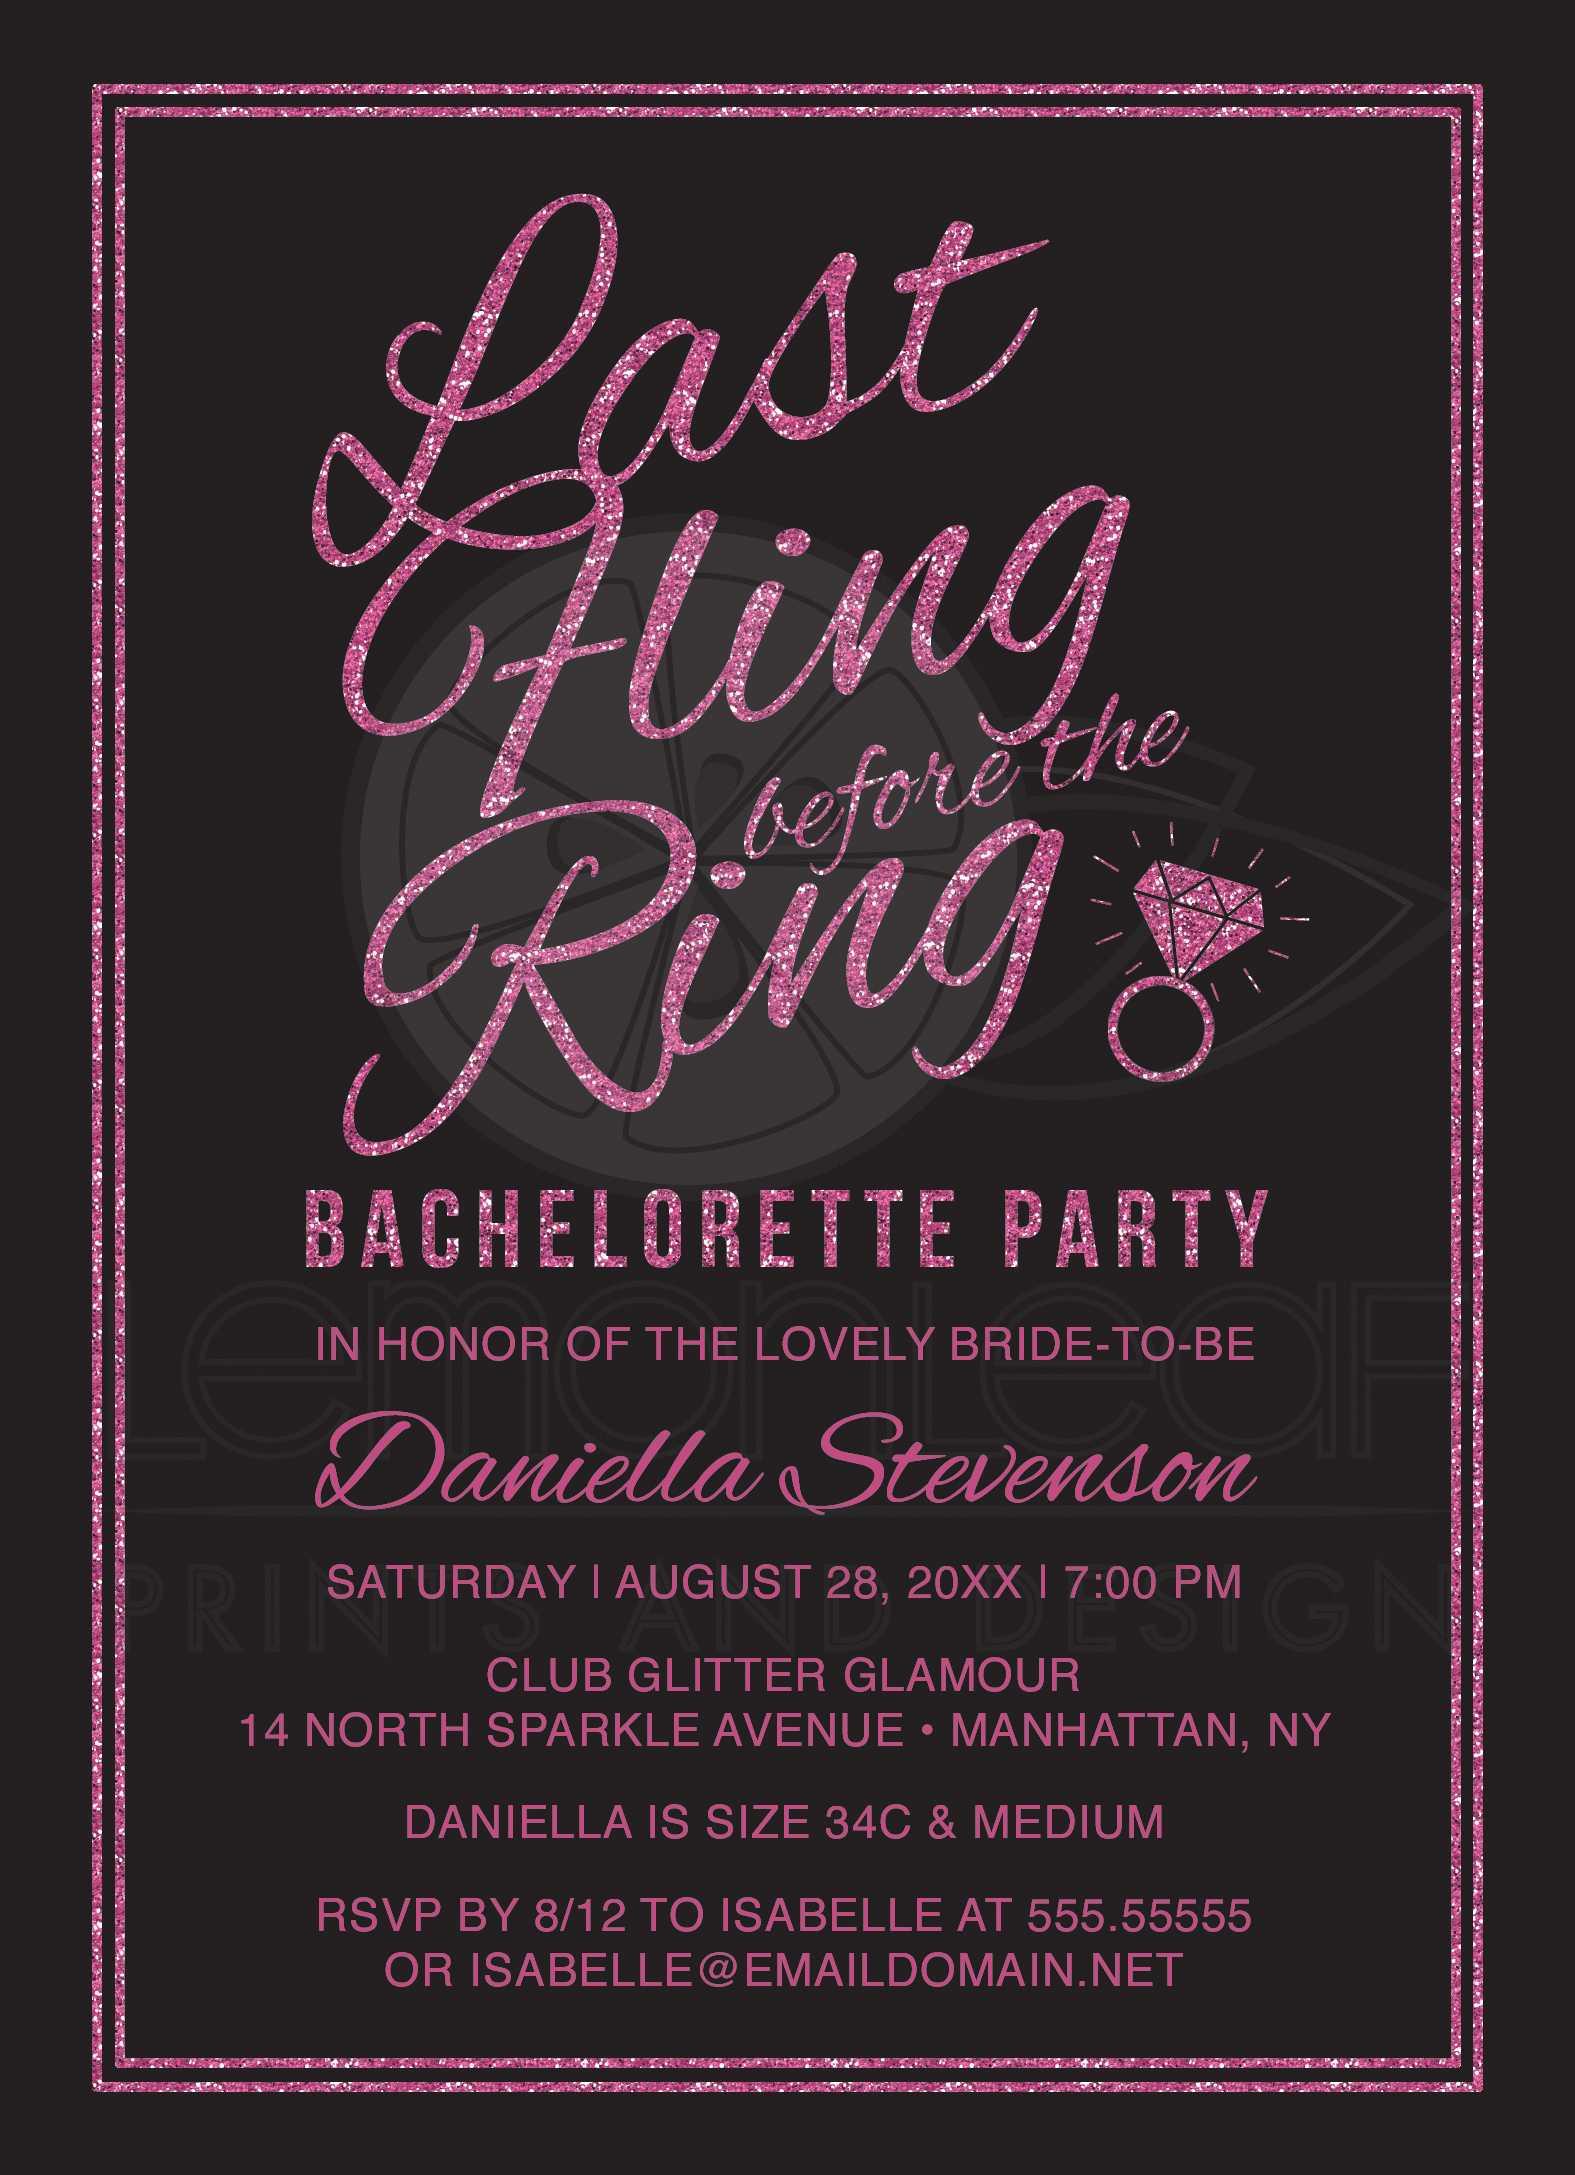 Bachelorette Party Invitations - Hot Pink Glitter Look Last Fling ...